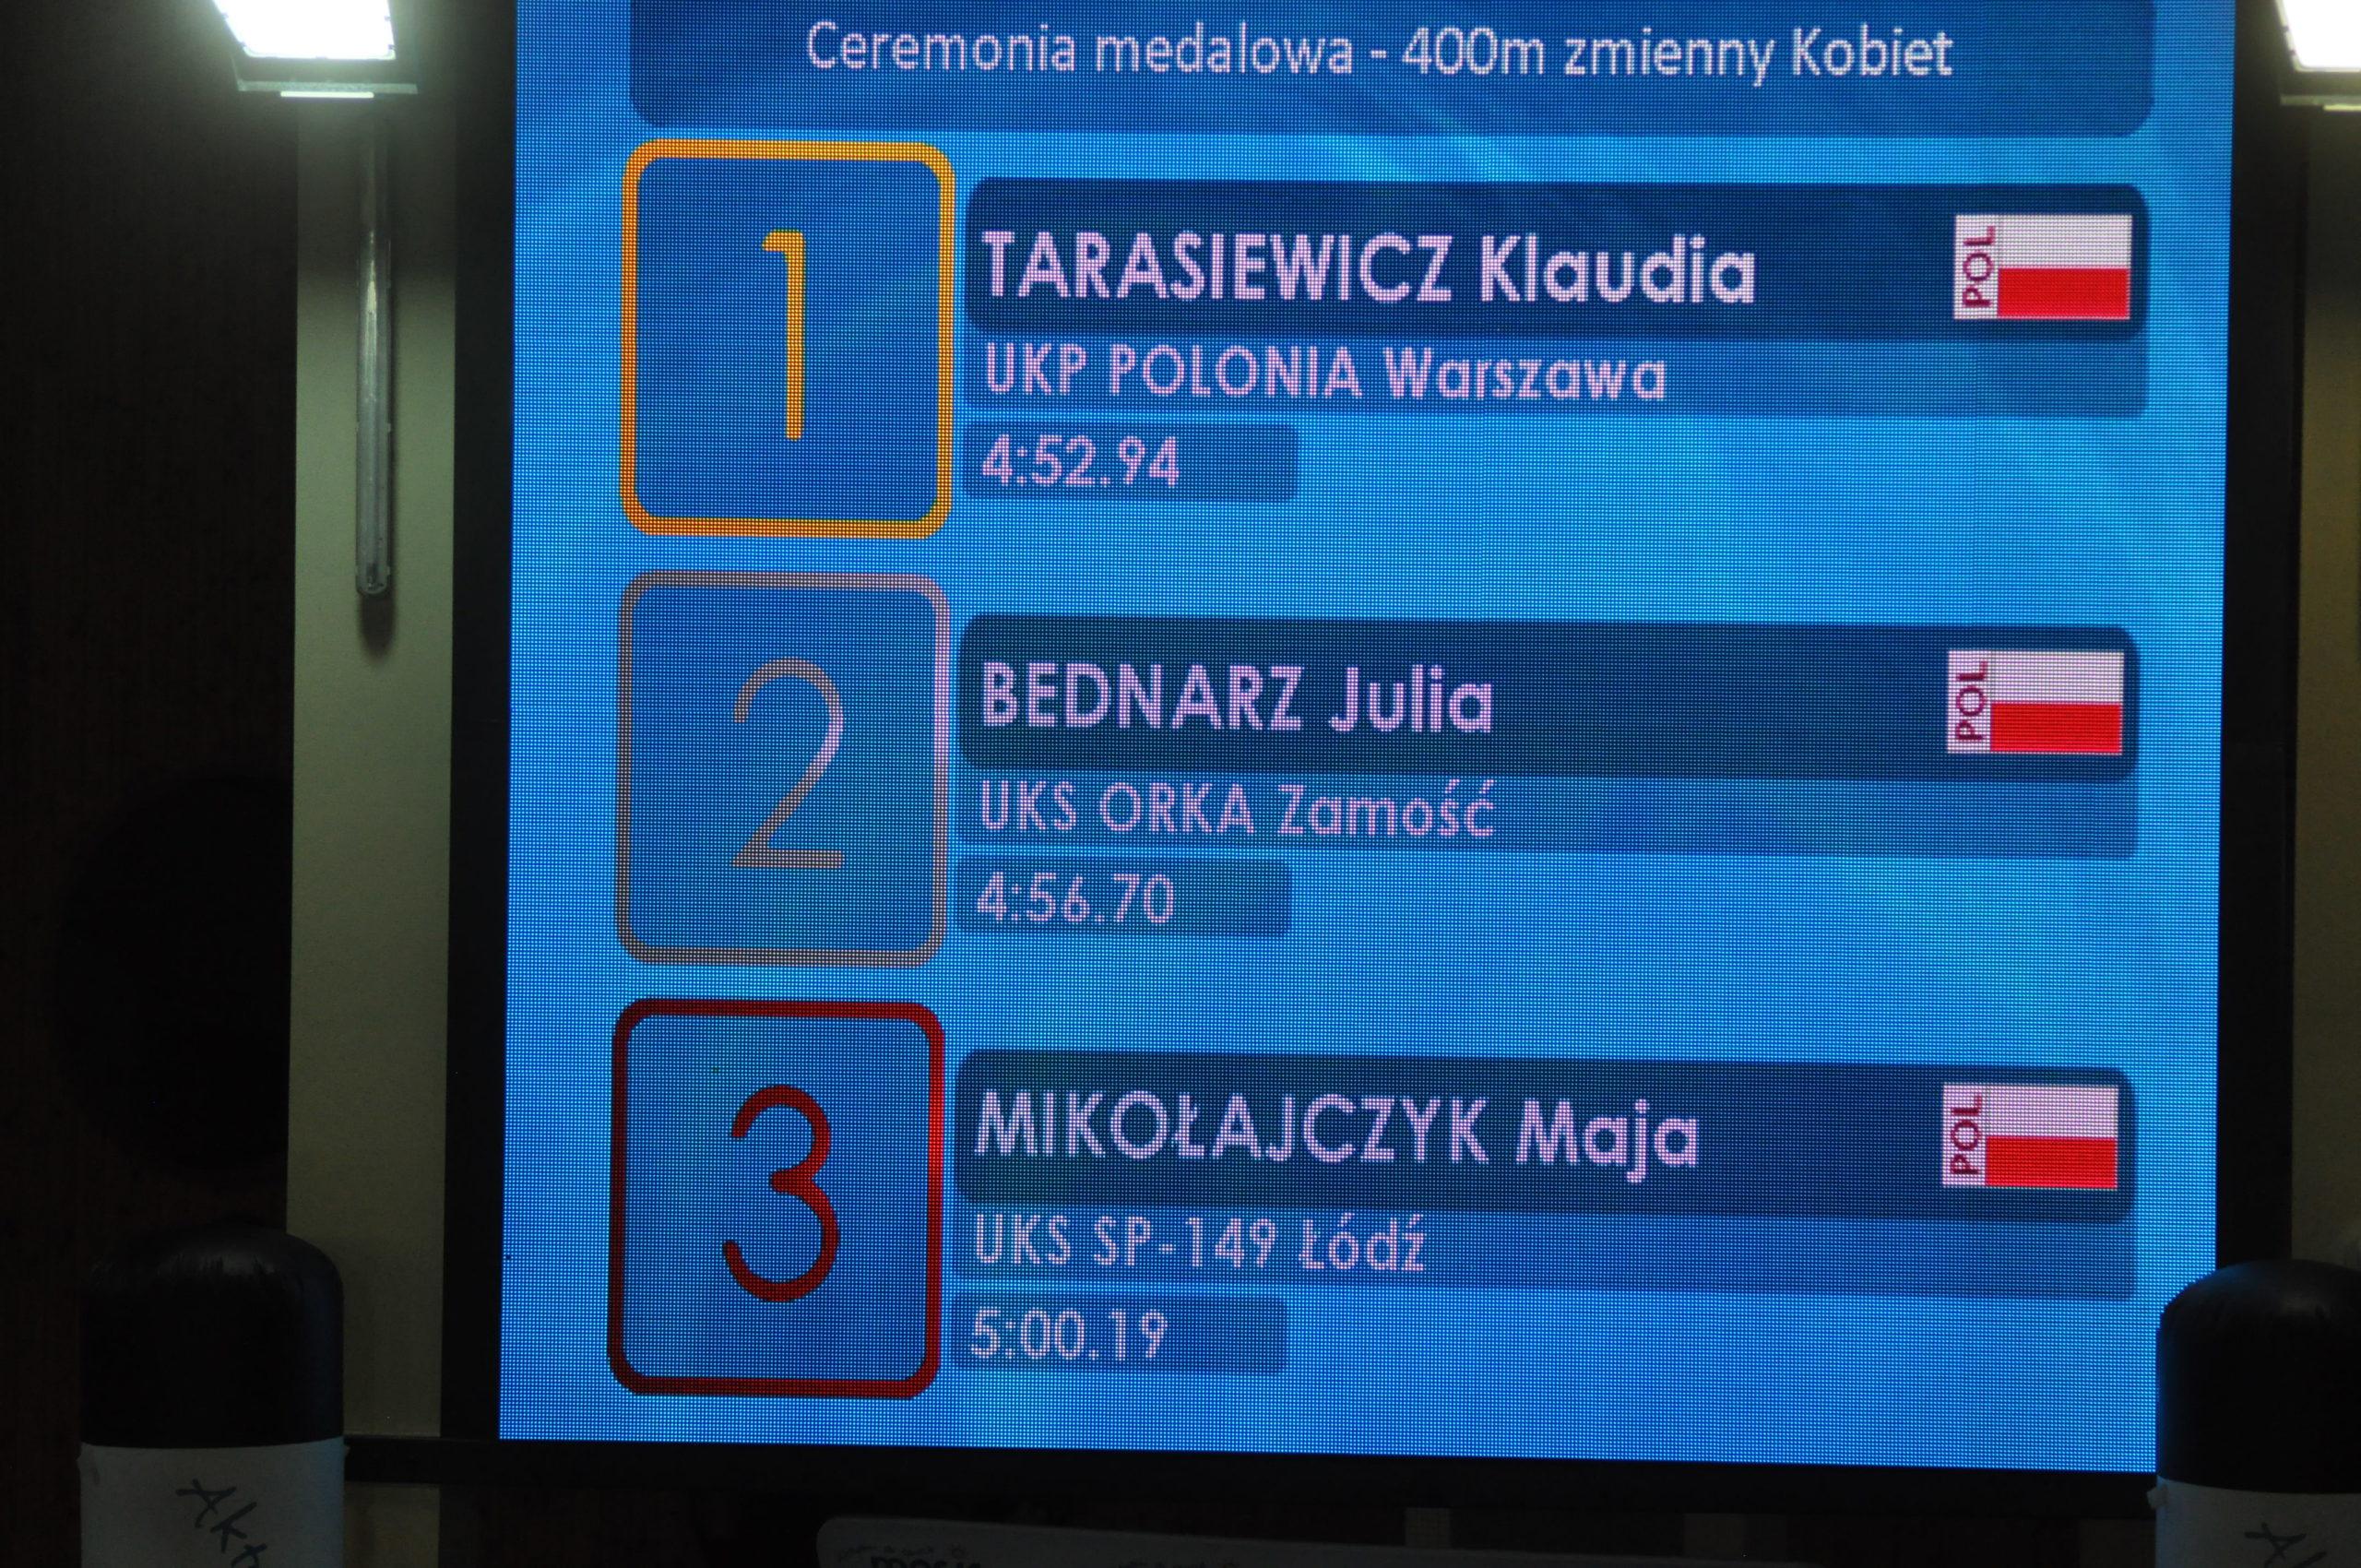 dsc 0046 scaled 1 ZŁOTA Klaudia, SREBRNA Julka!